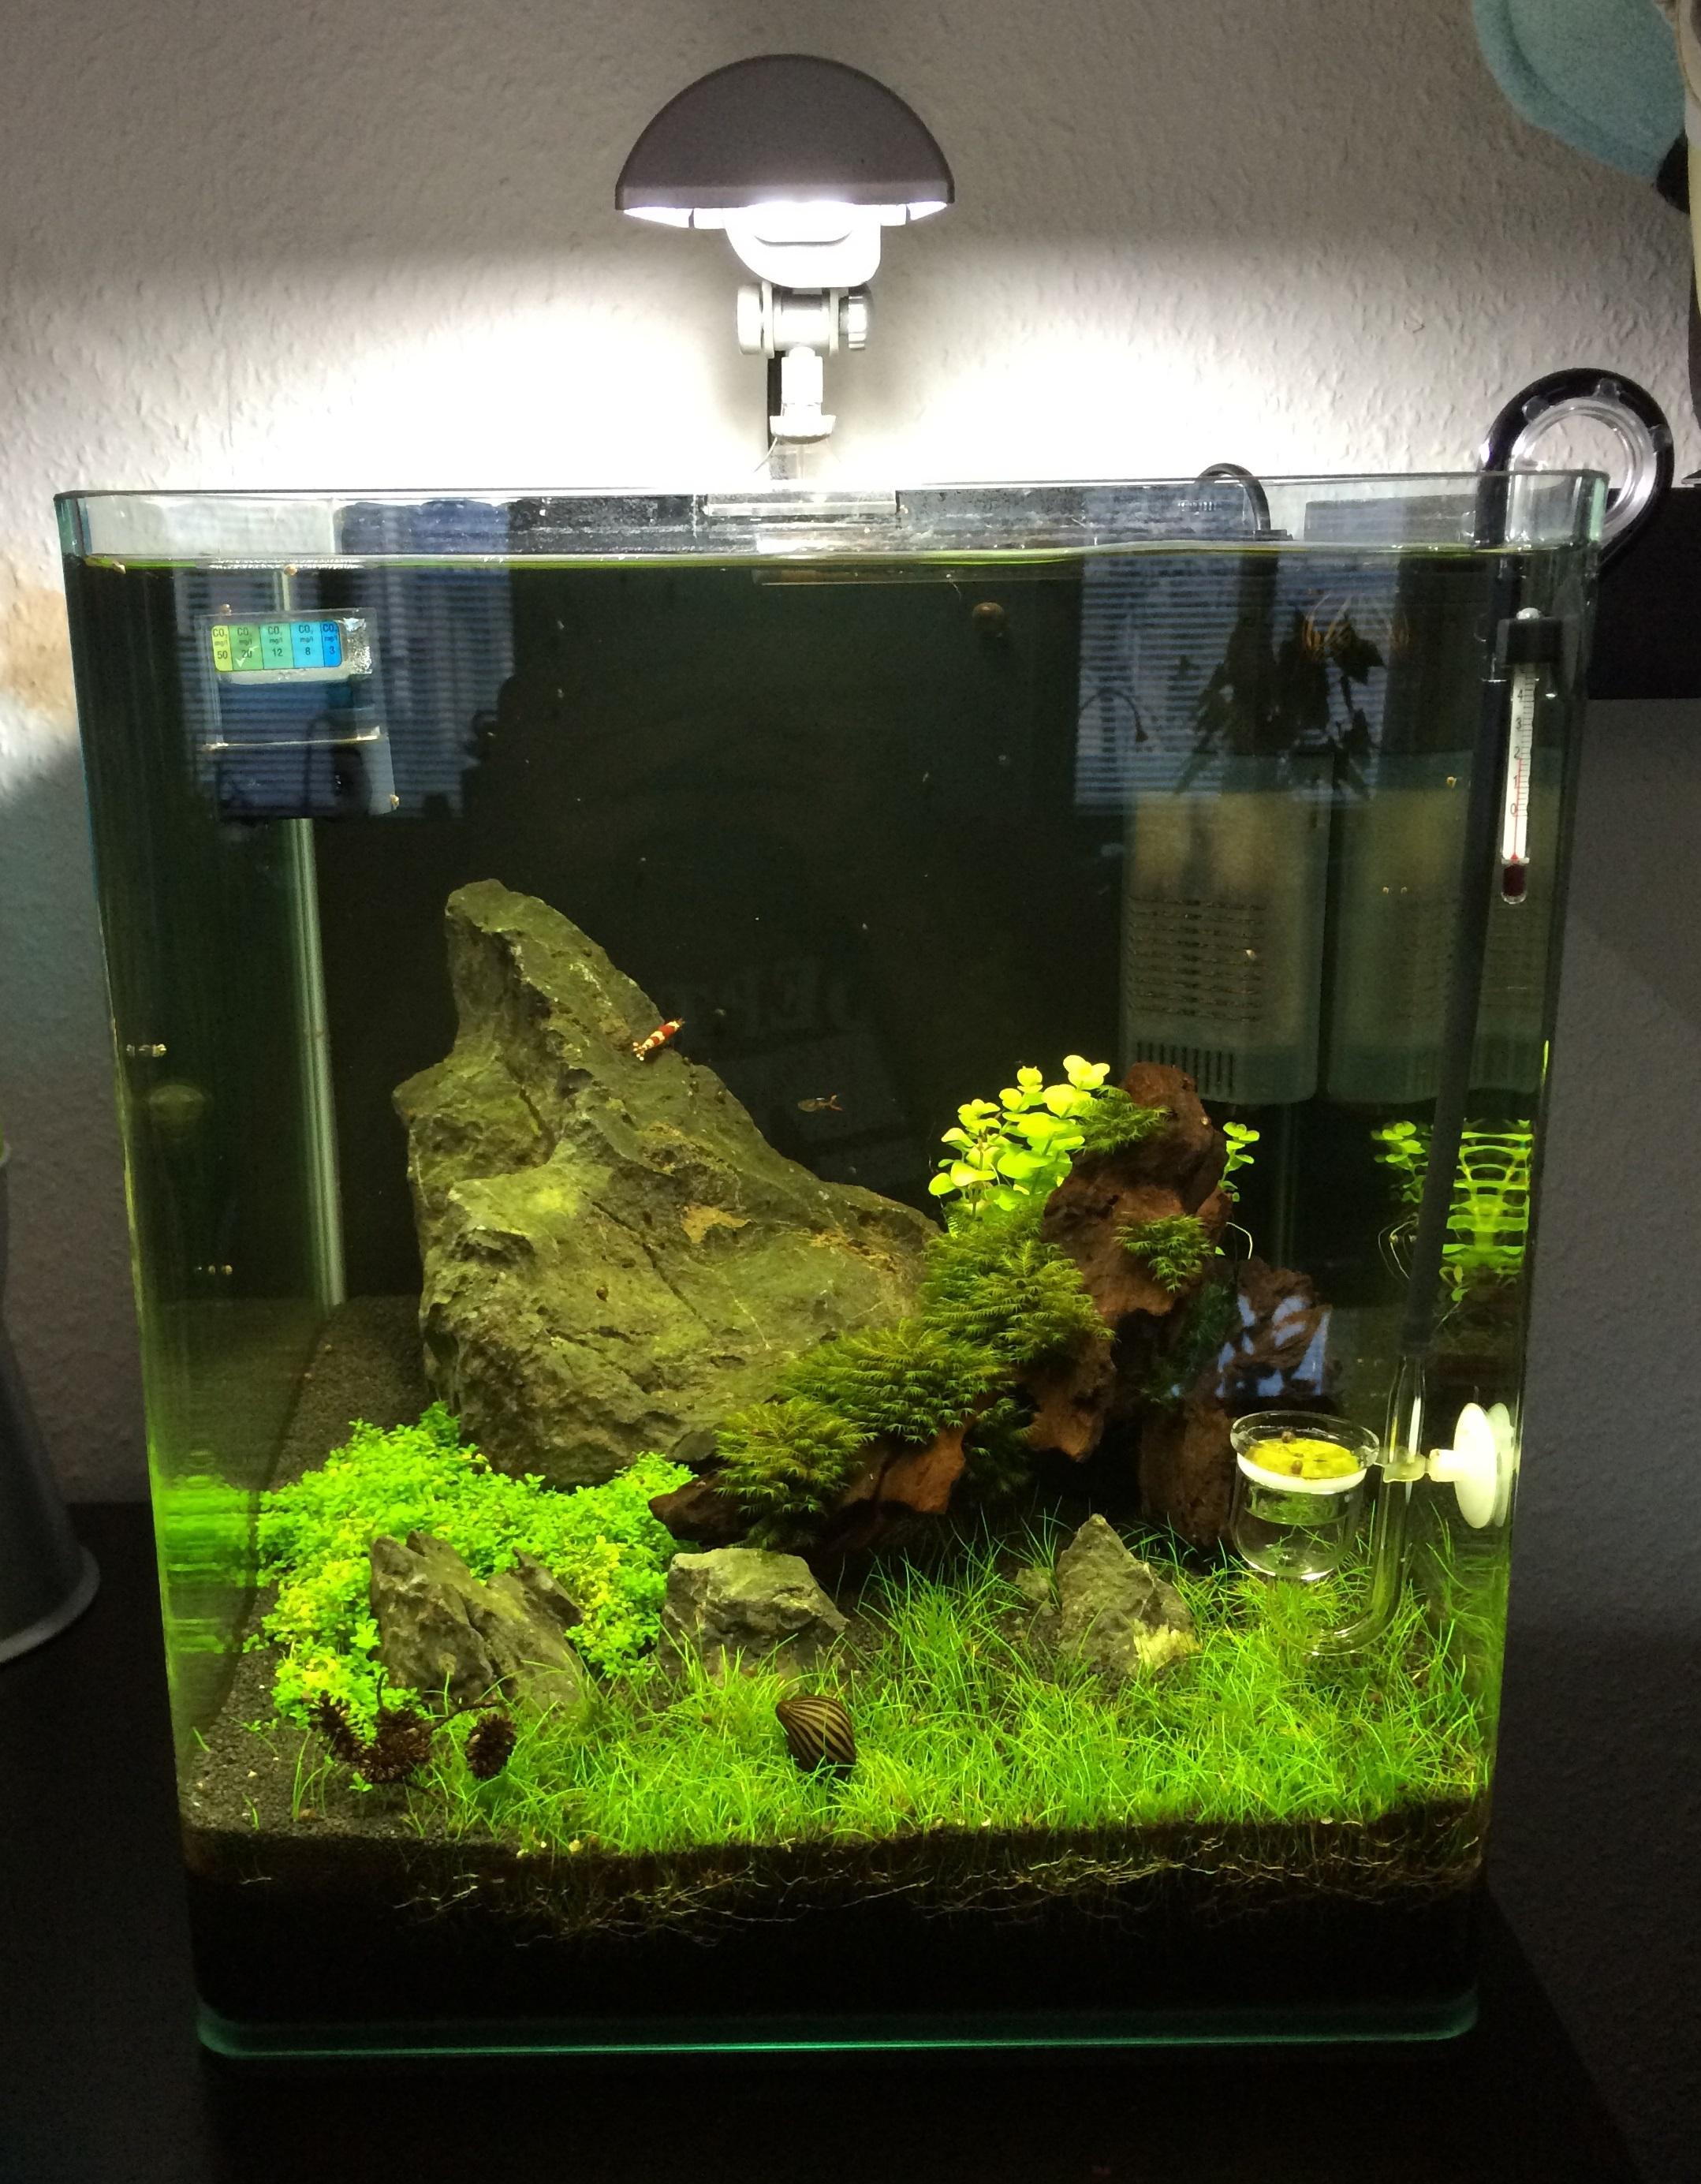 diy led lampe selber bauen seite 48 aquariumbeleuchtung aquascaping forum. Black Bedroom Furniture Sets. Home Design Ideas